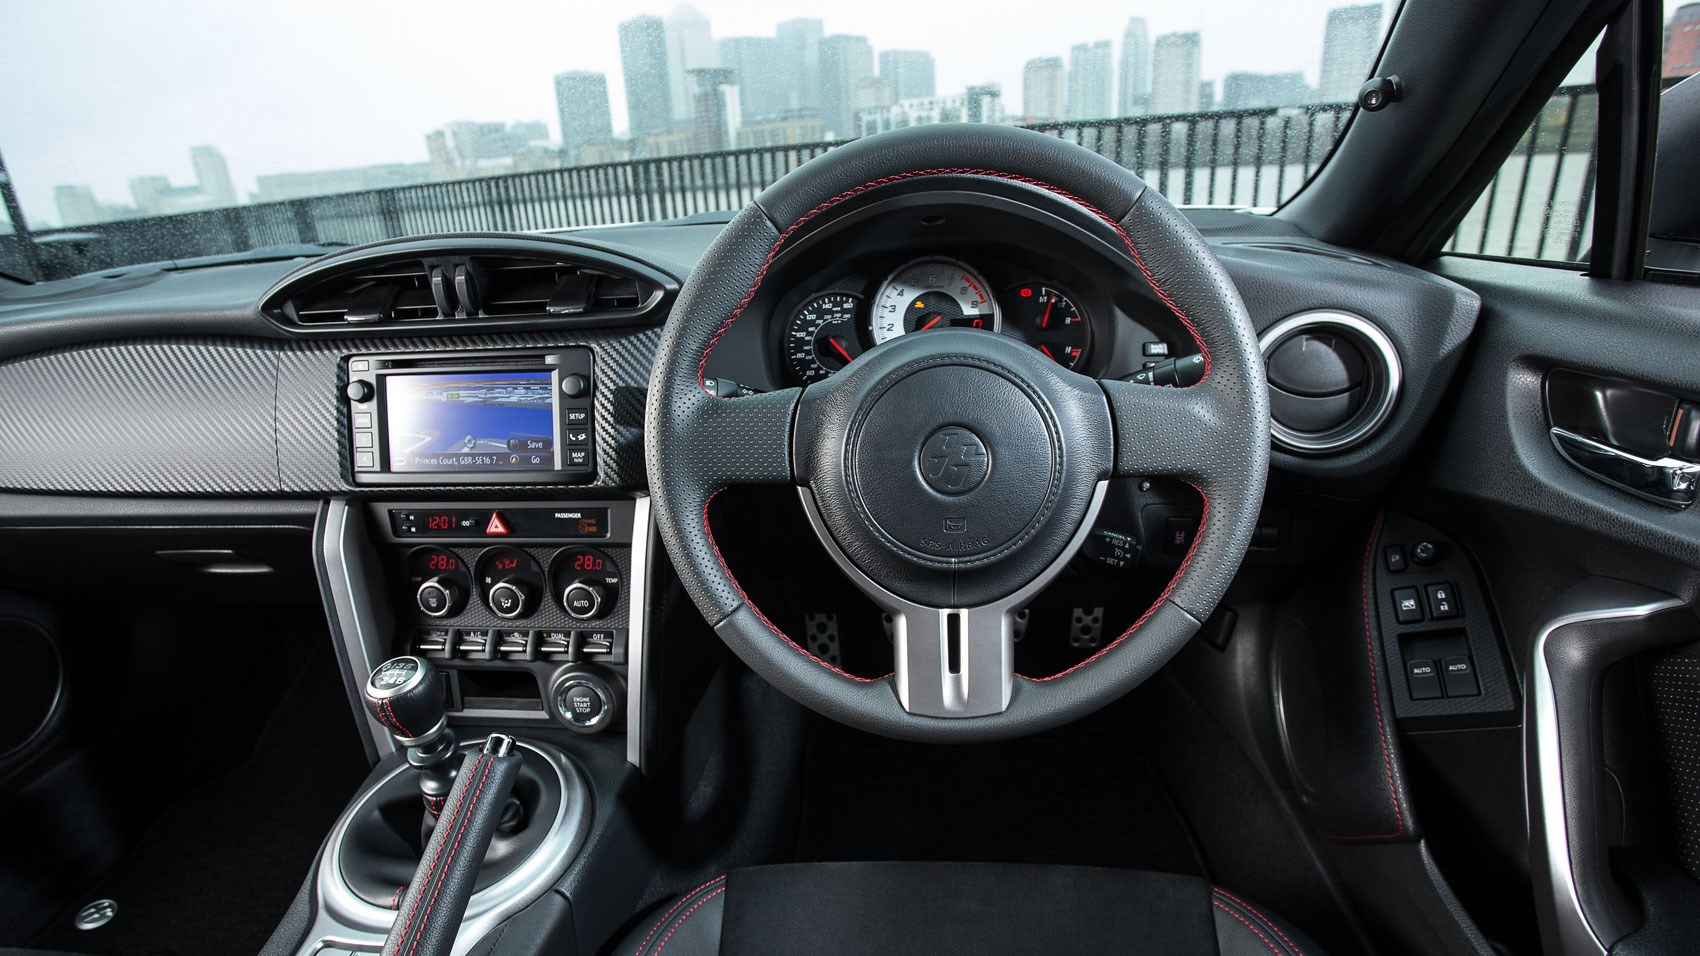 Subaru Brz Lease >> Toyota GT86 Aero (2015) review | CAR Magazine